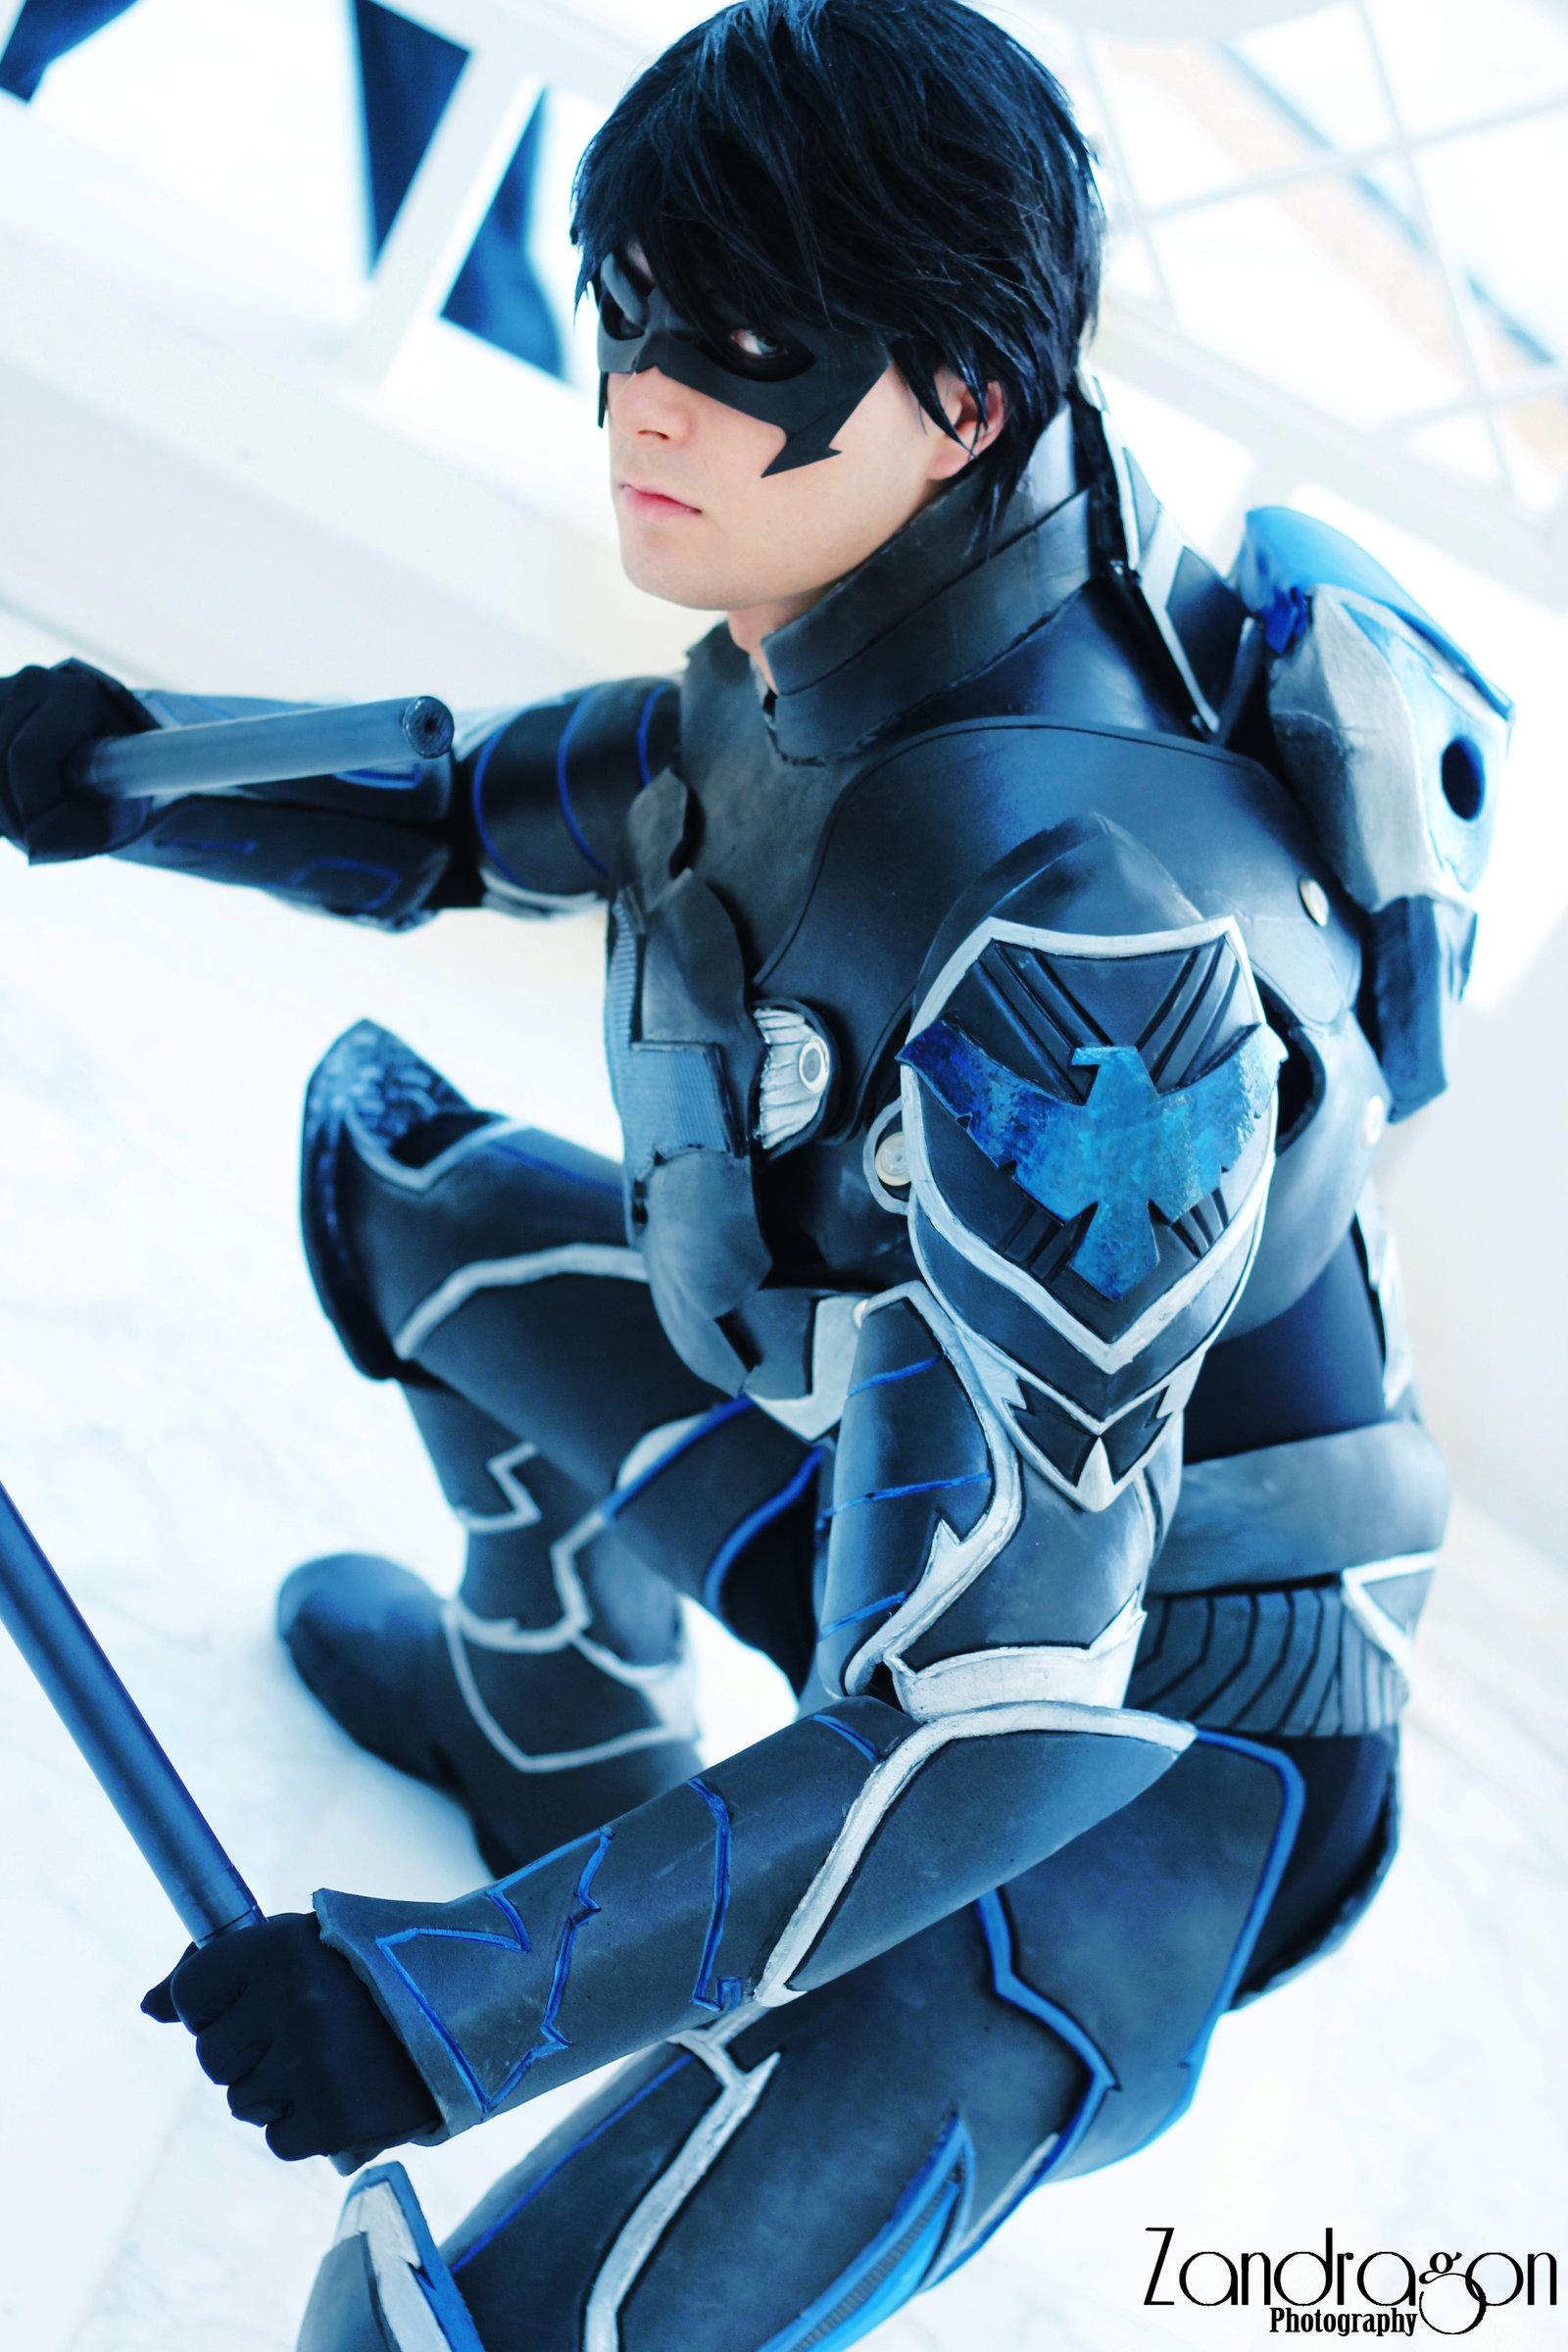 Cloudbreak Cosplay  is Nightwing   Photo by  Zandragon Photography